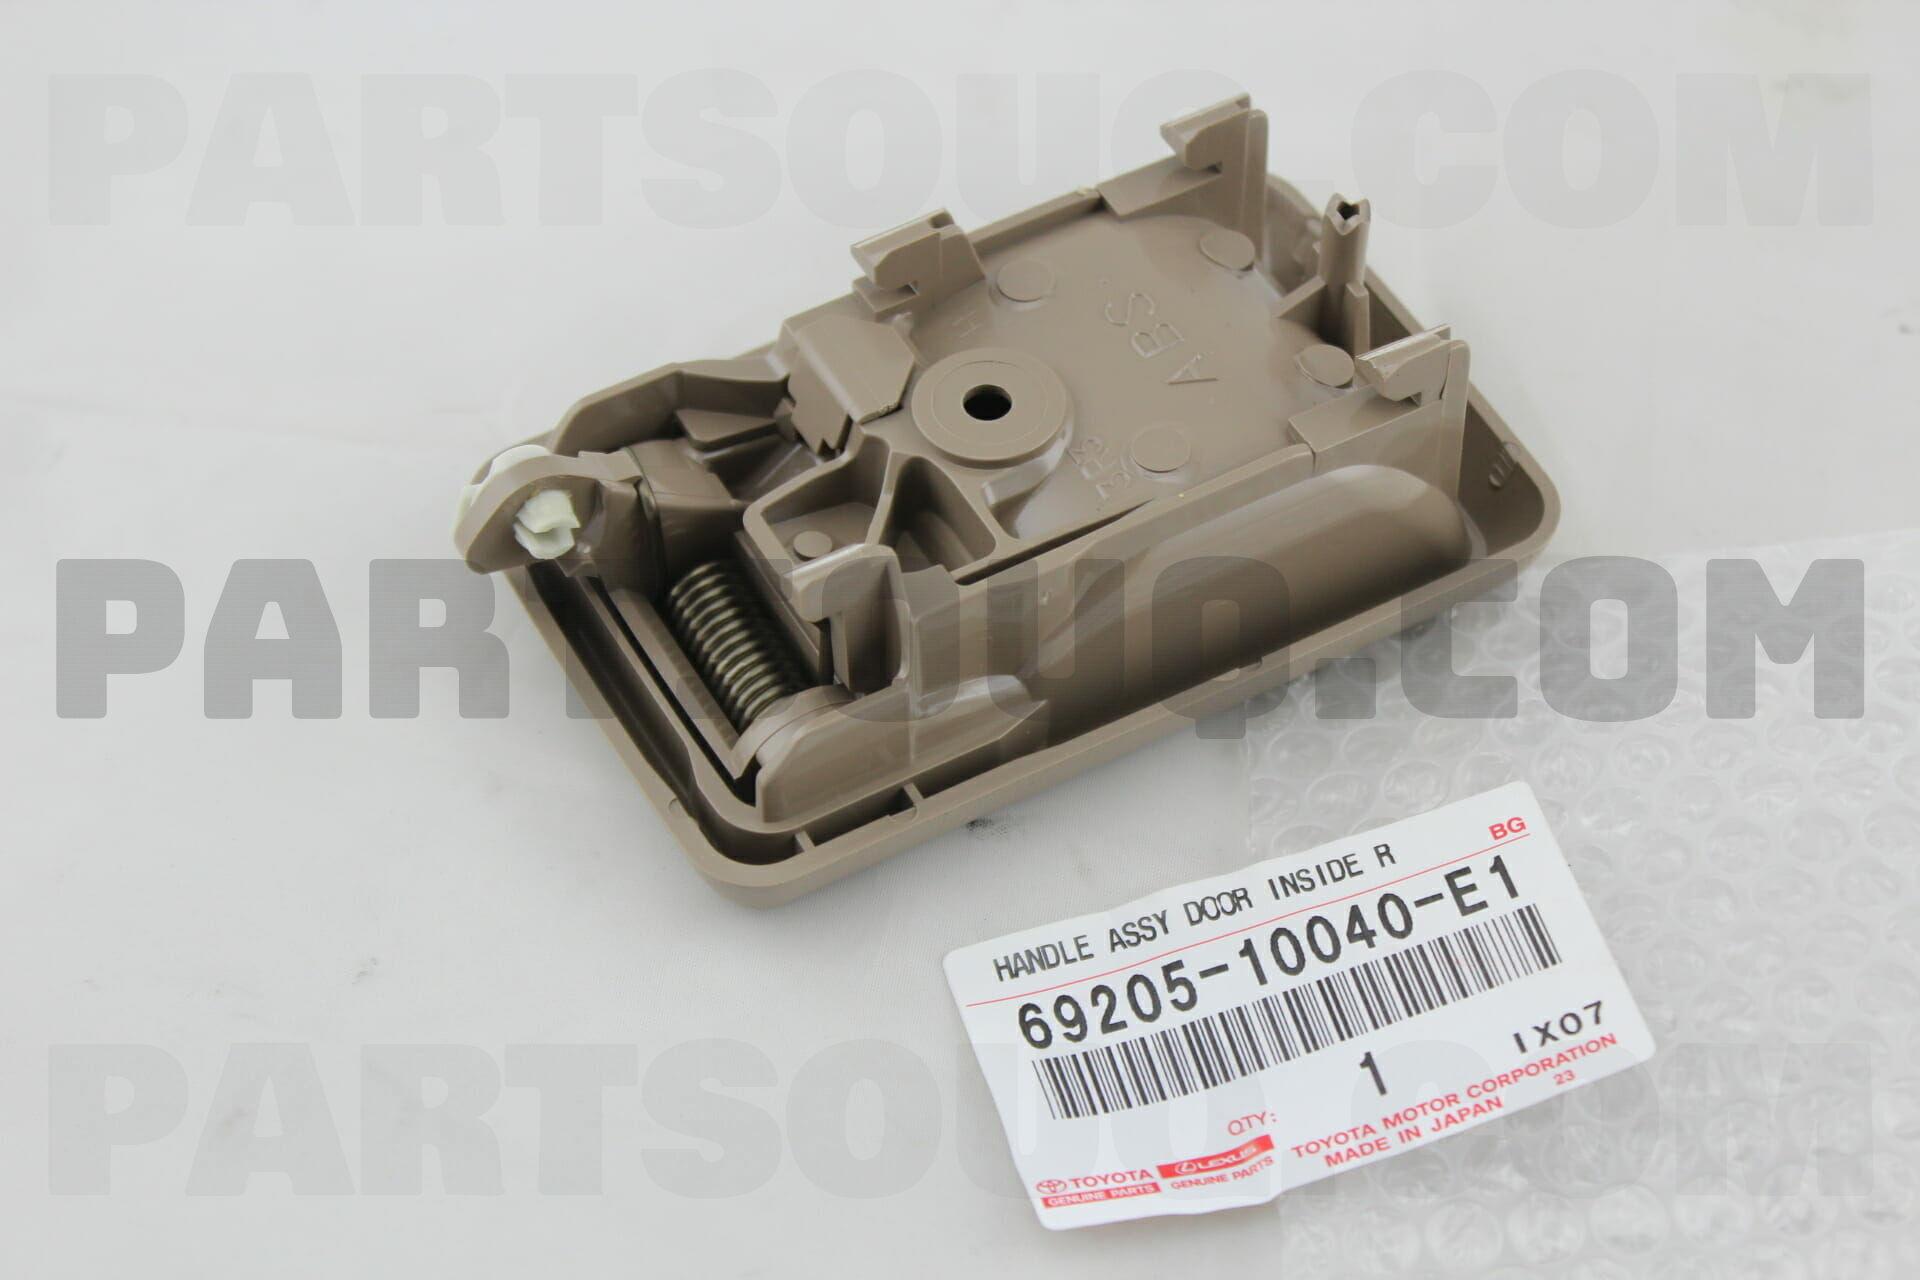 Toyota 6920510040E1 HANDLE SUB ASSY, FRONT DOOR INSIDE, RH